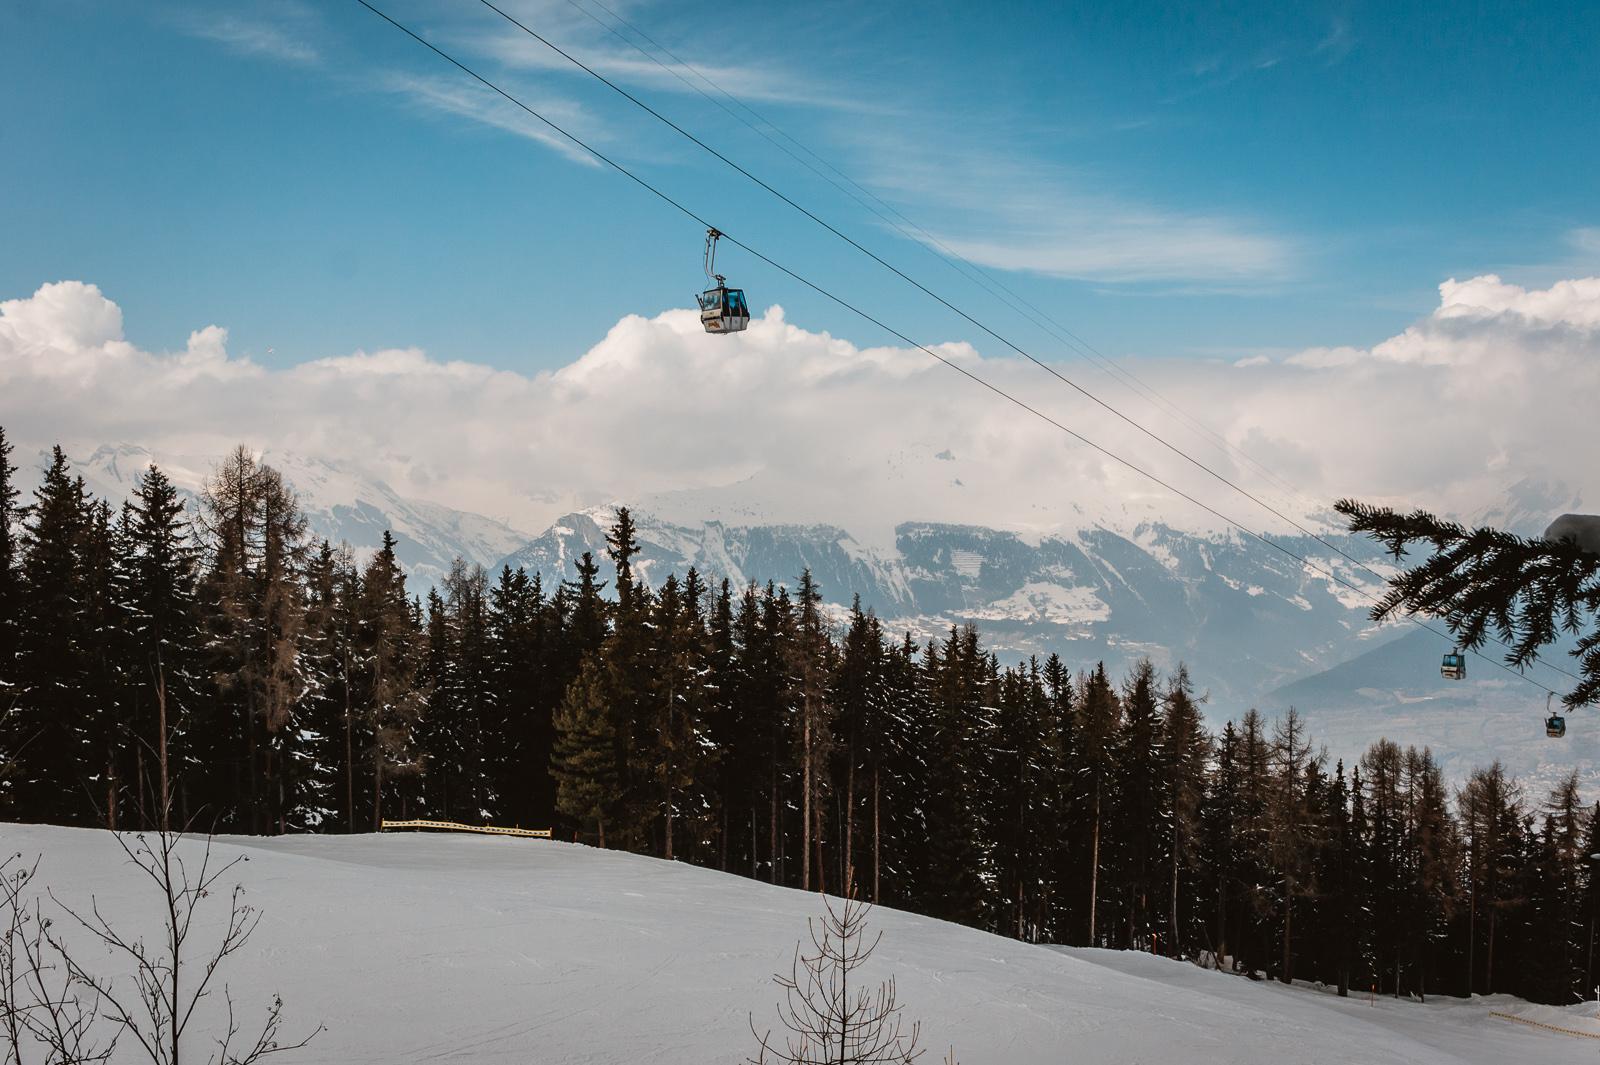 Verbier ski resort - Verbier Switzerland Ski Trip